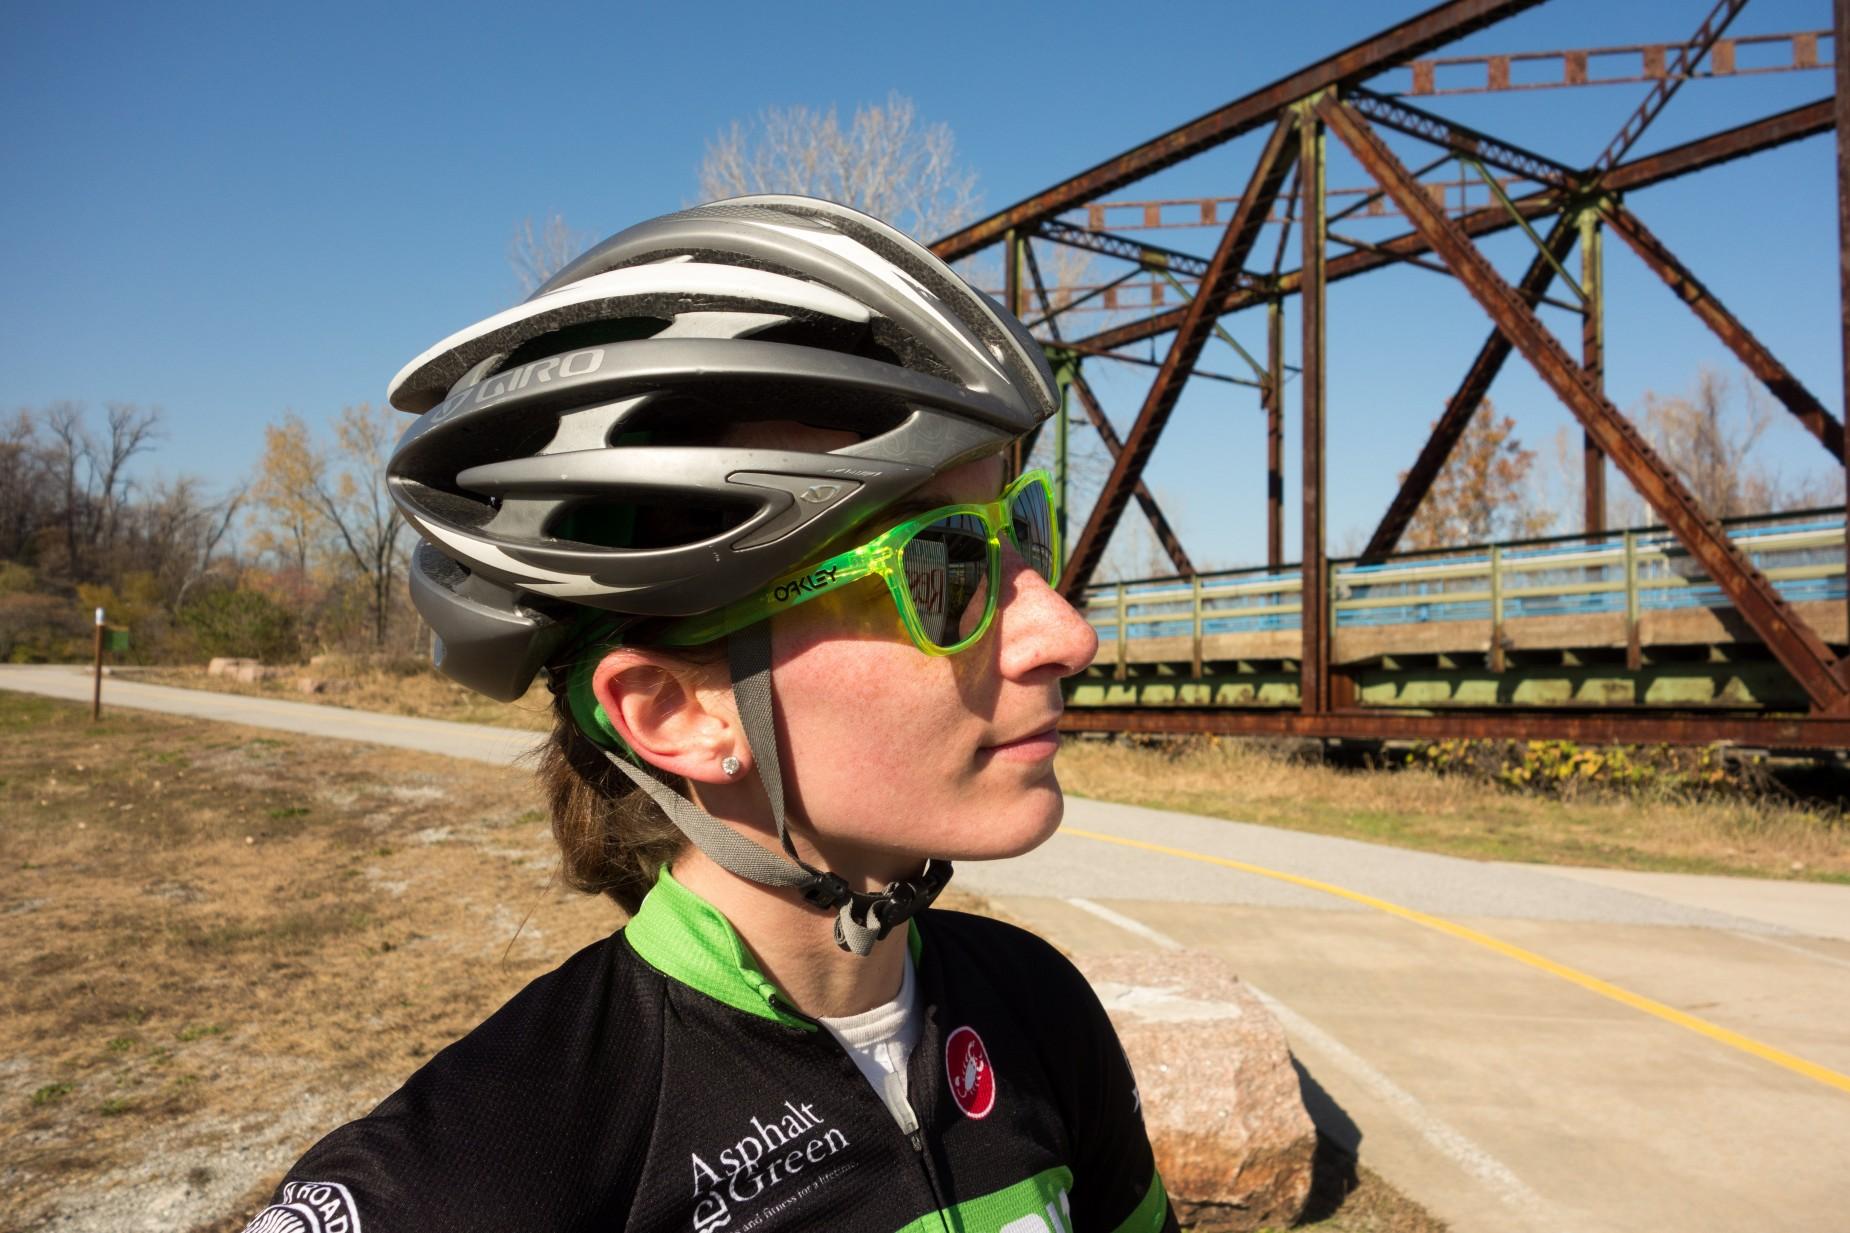 St-Louis-Bicycling-Riverview-Trail-29-1850x1233.jpg